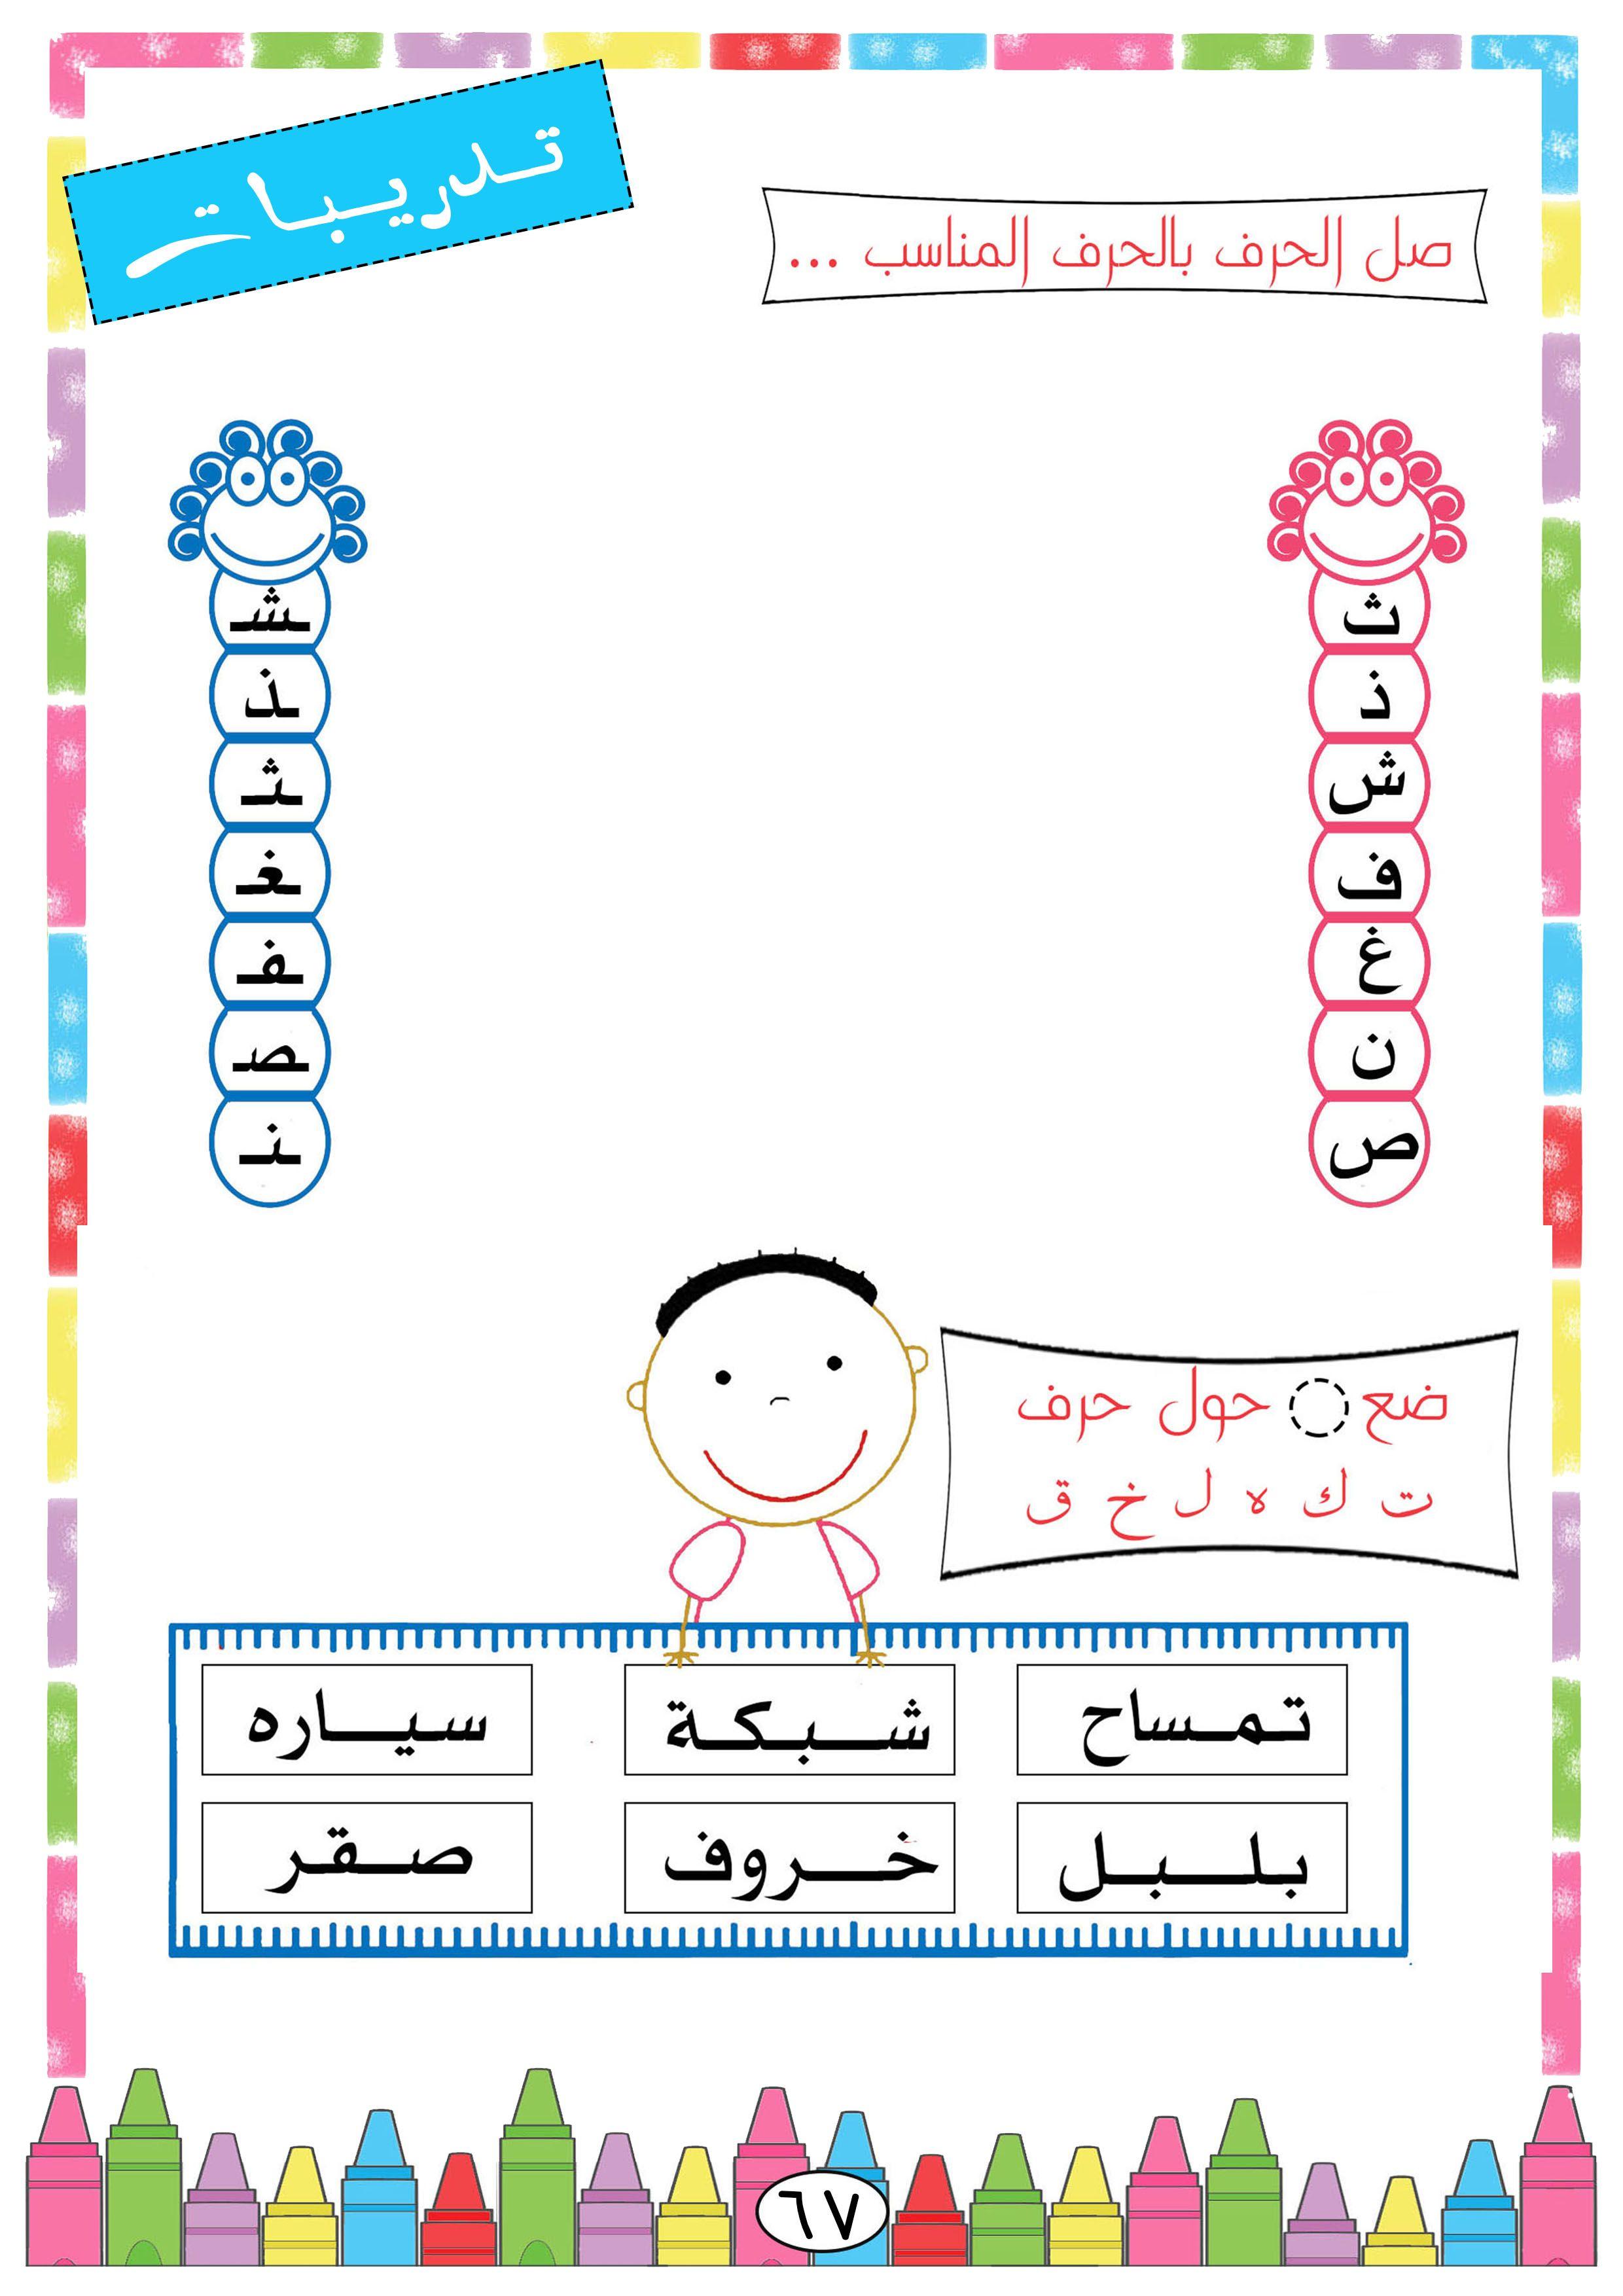 Arabic Learning Arabic Arabic Kids Arabic Alphabet For Kids